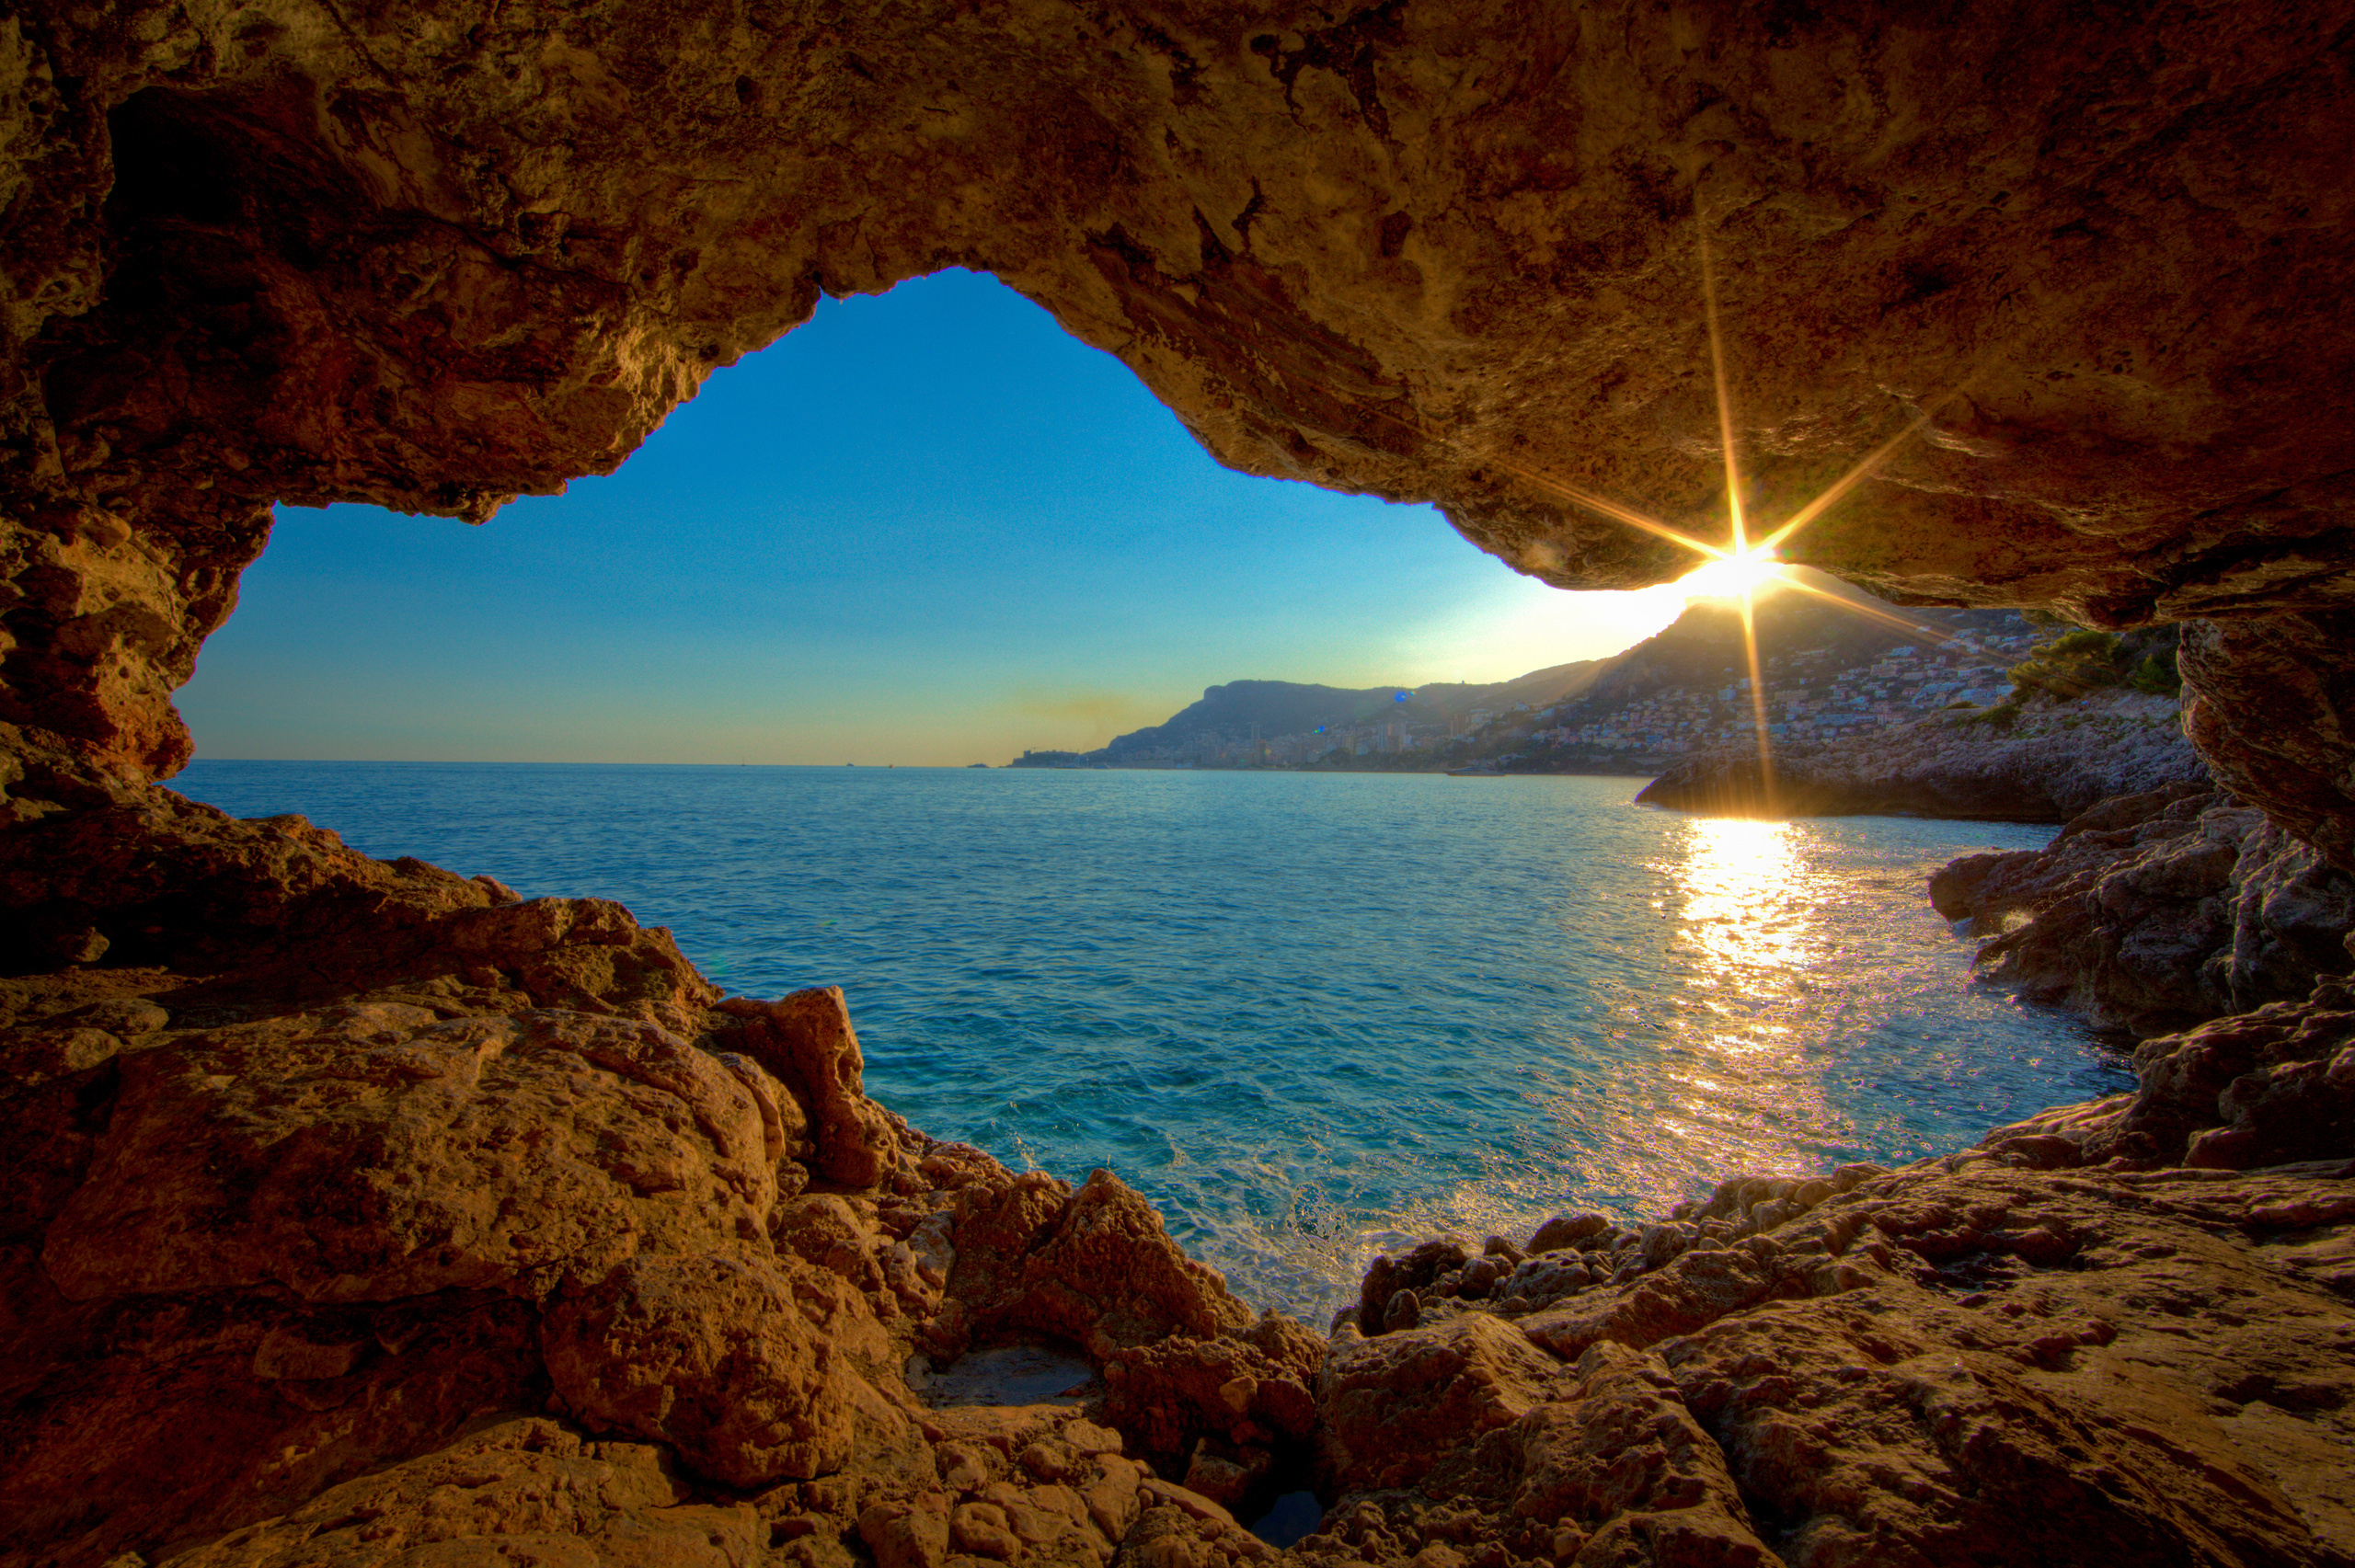 Hd wallpaper cave -  Hd Pic Underwater Cave 17698 Underwater Cave 1920x1200 Beach Wallpaper